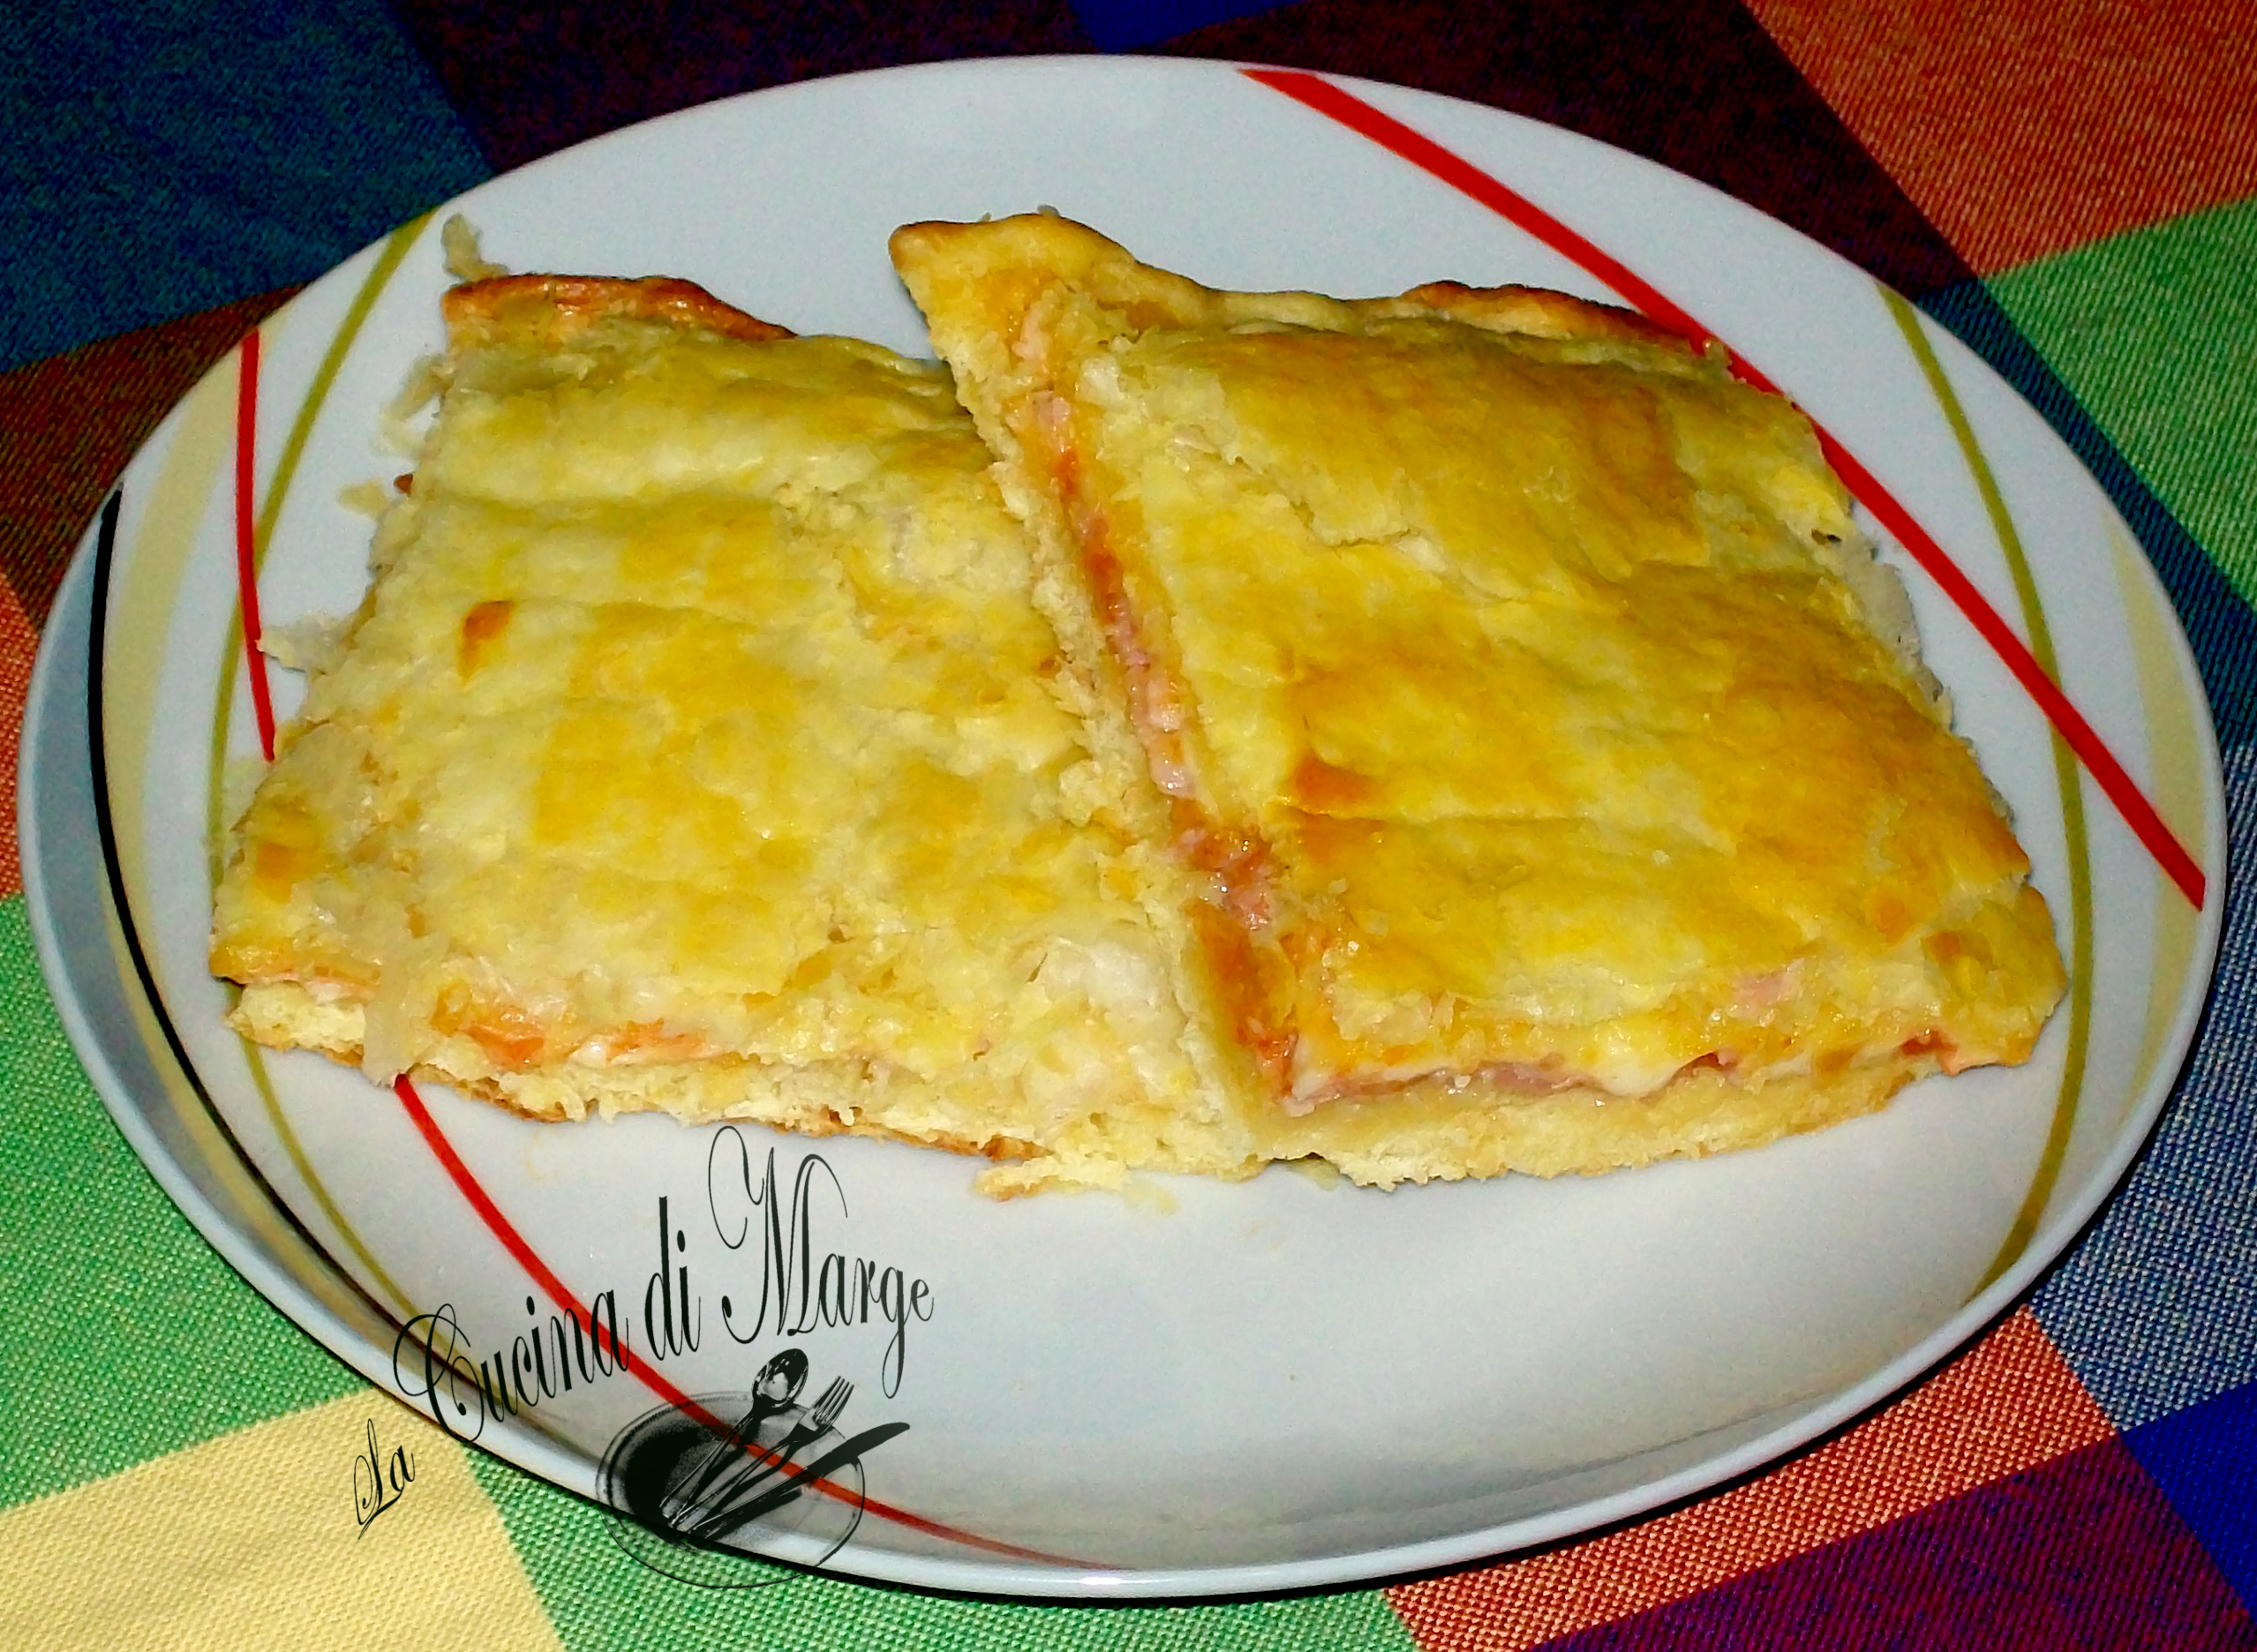 pizza pizza rustica by brendareed pizza rustica by abarbieri pizza